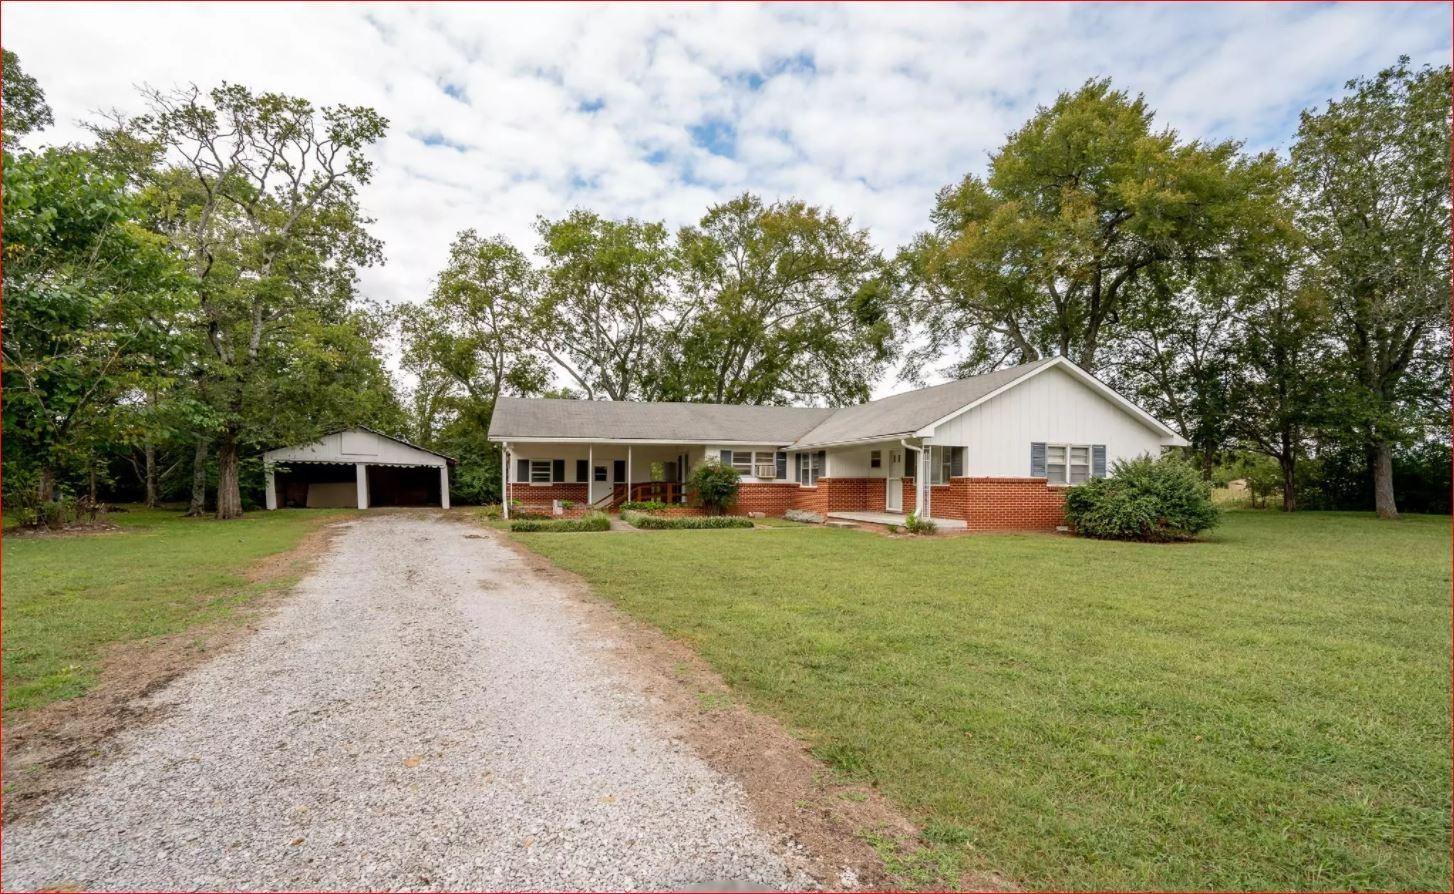 Photo of 616 Weeks Rd, Murfreesboro, TN 37127 (MLS # 2292337)